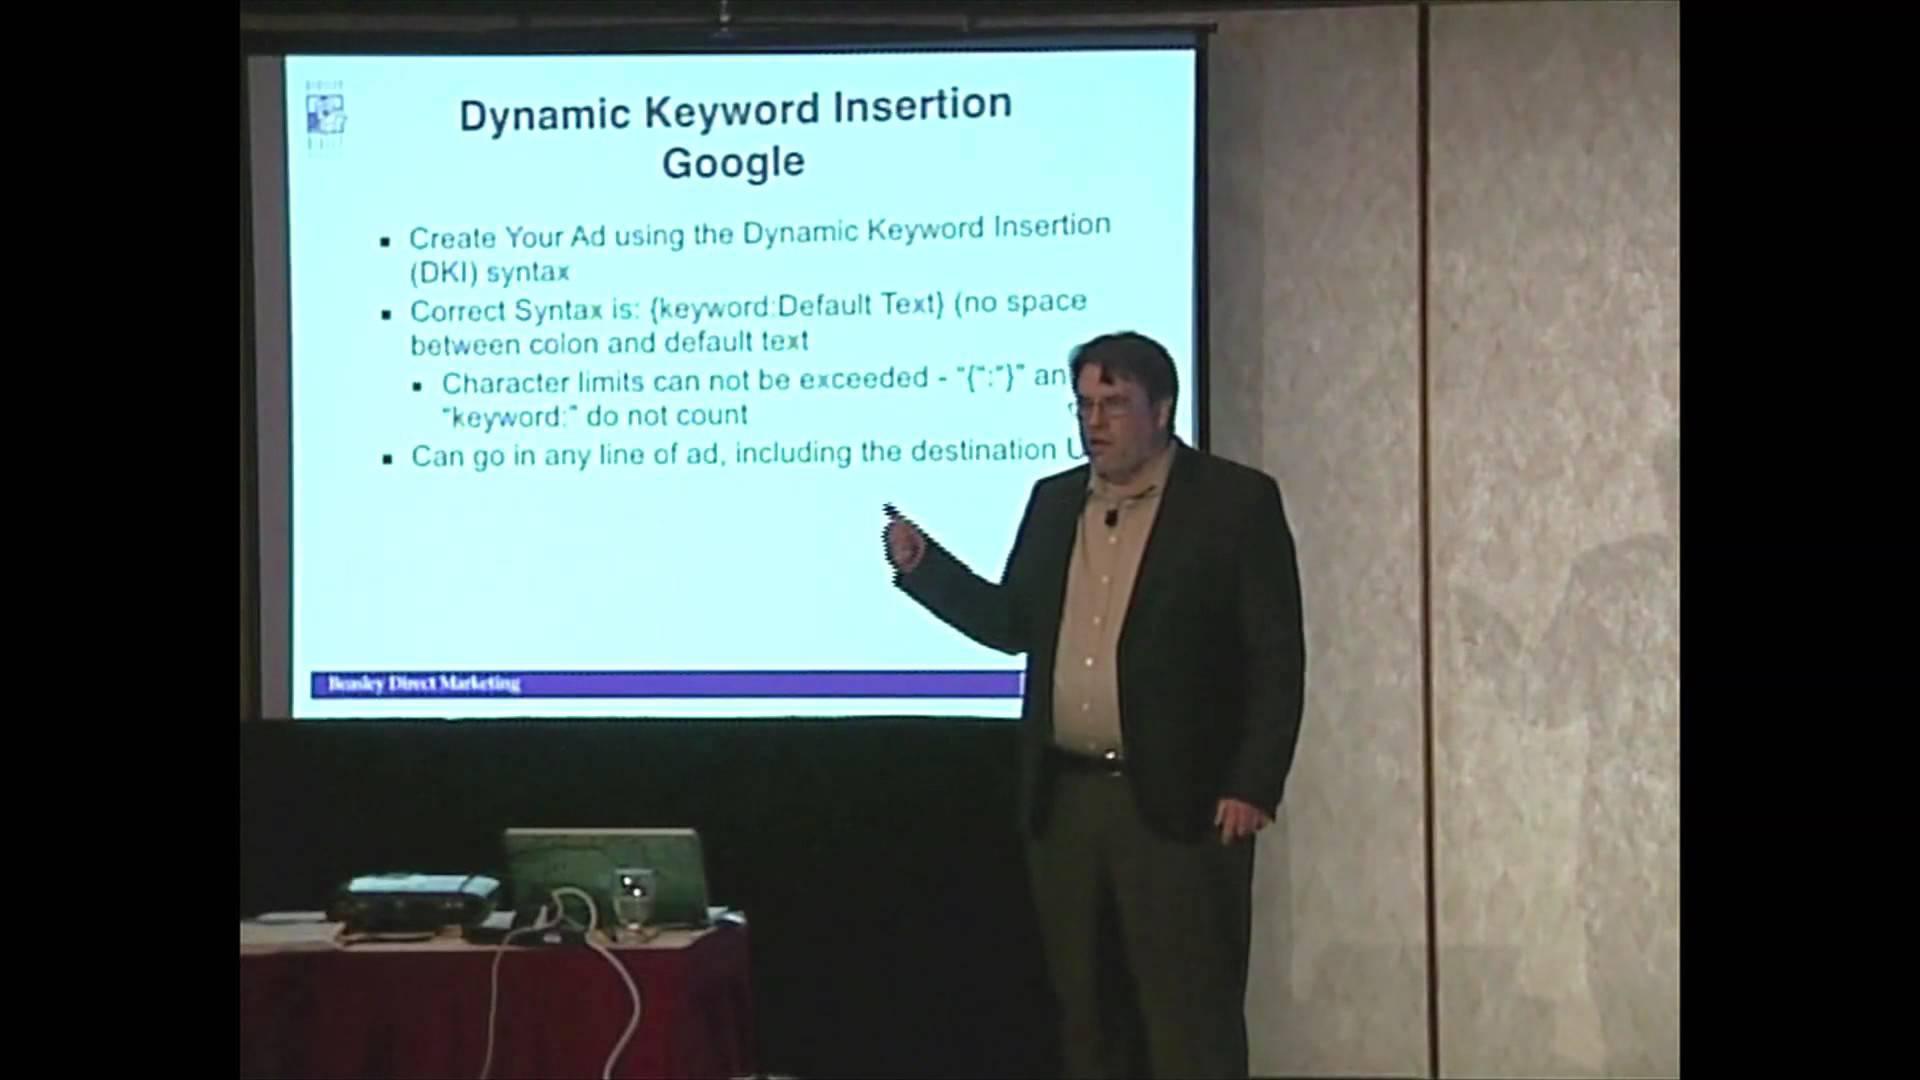 Dynamic Keyword Insertion in PPC Ads